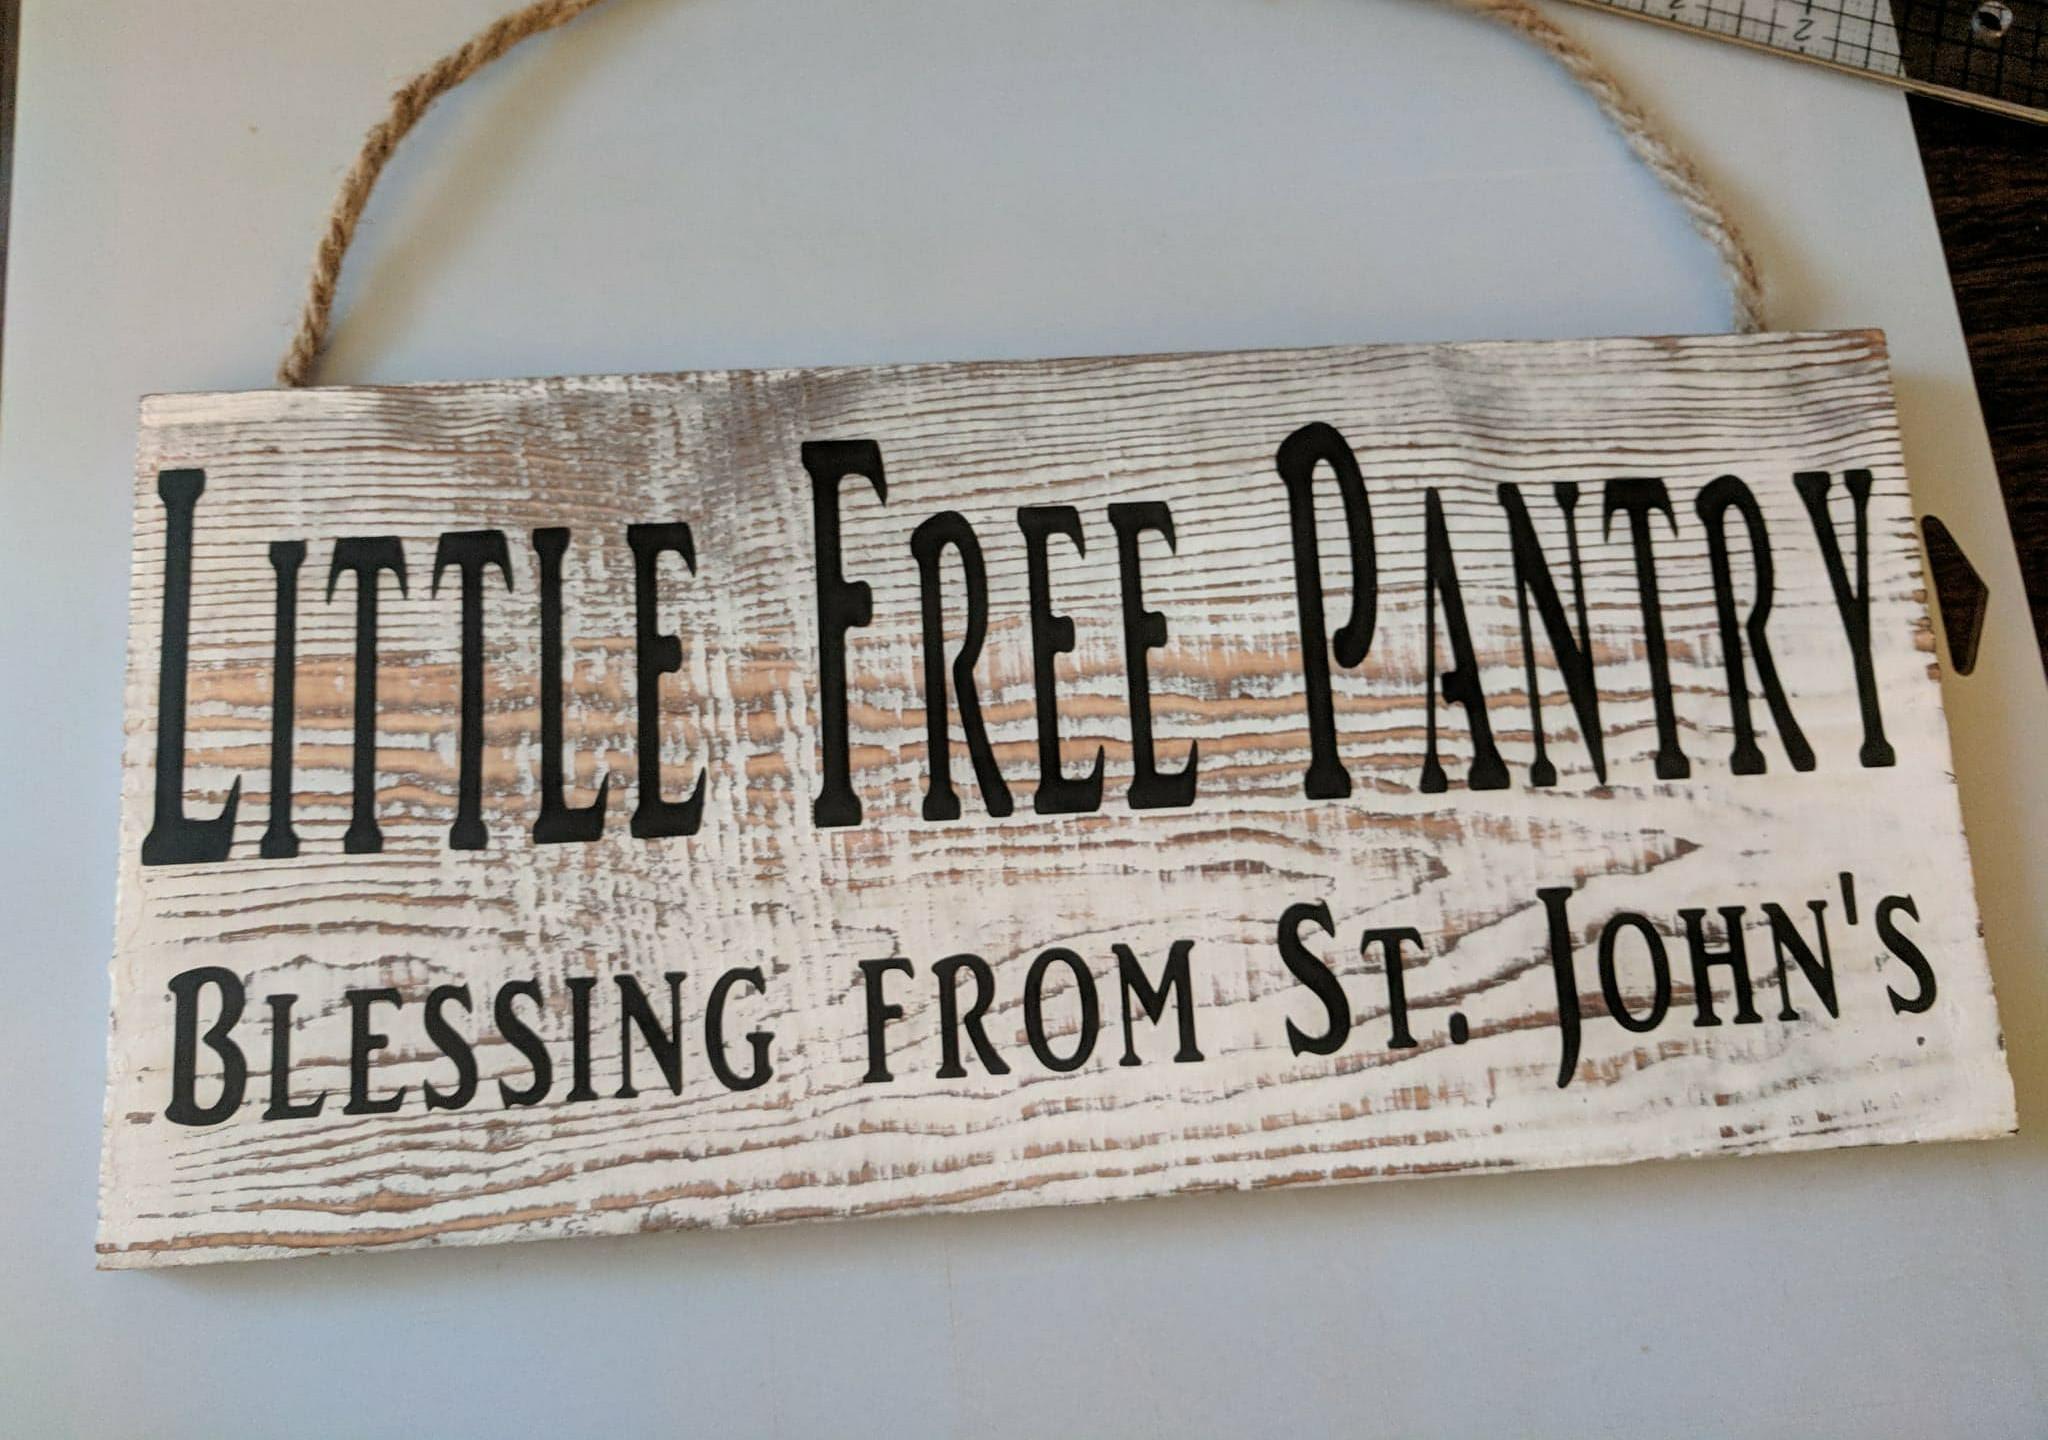 Frist Pantry advert